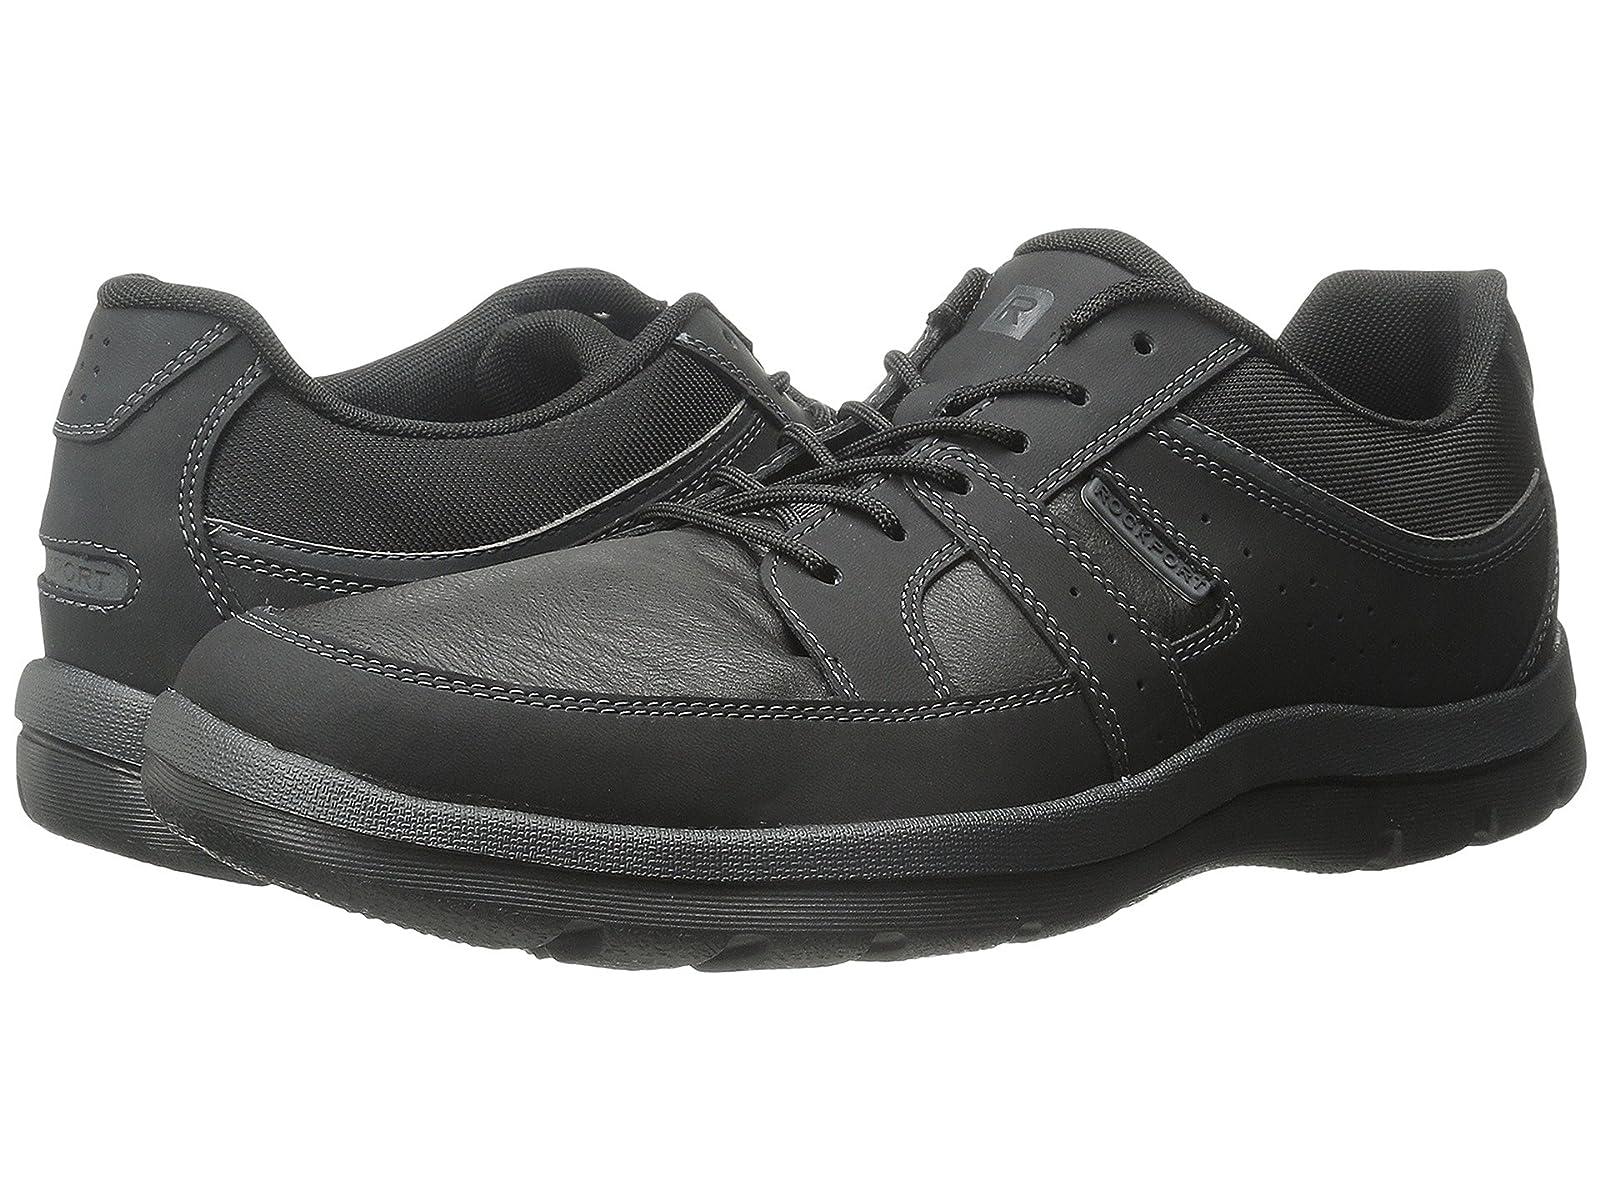 Rockport Get Your Kicks BlucherCheap and distinctive eye-catching shoes